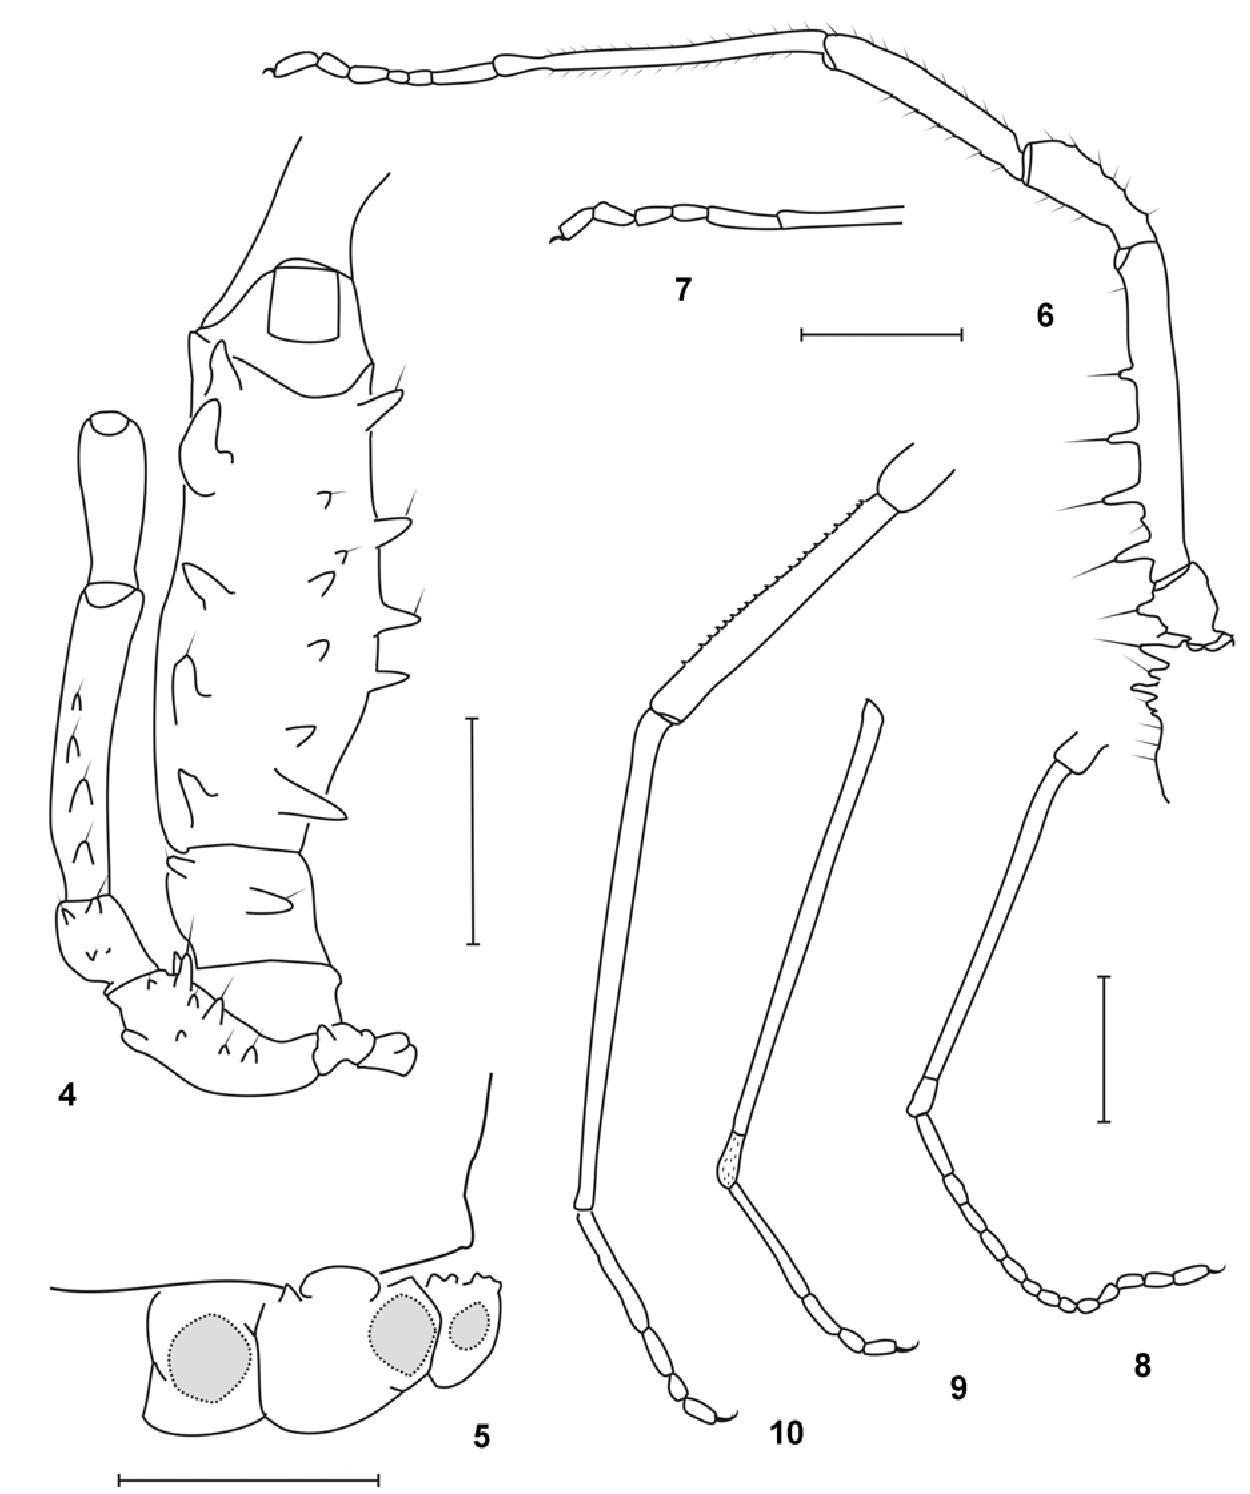 figure 4-10